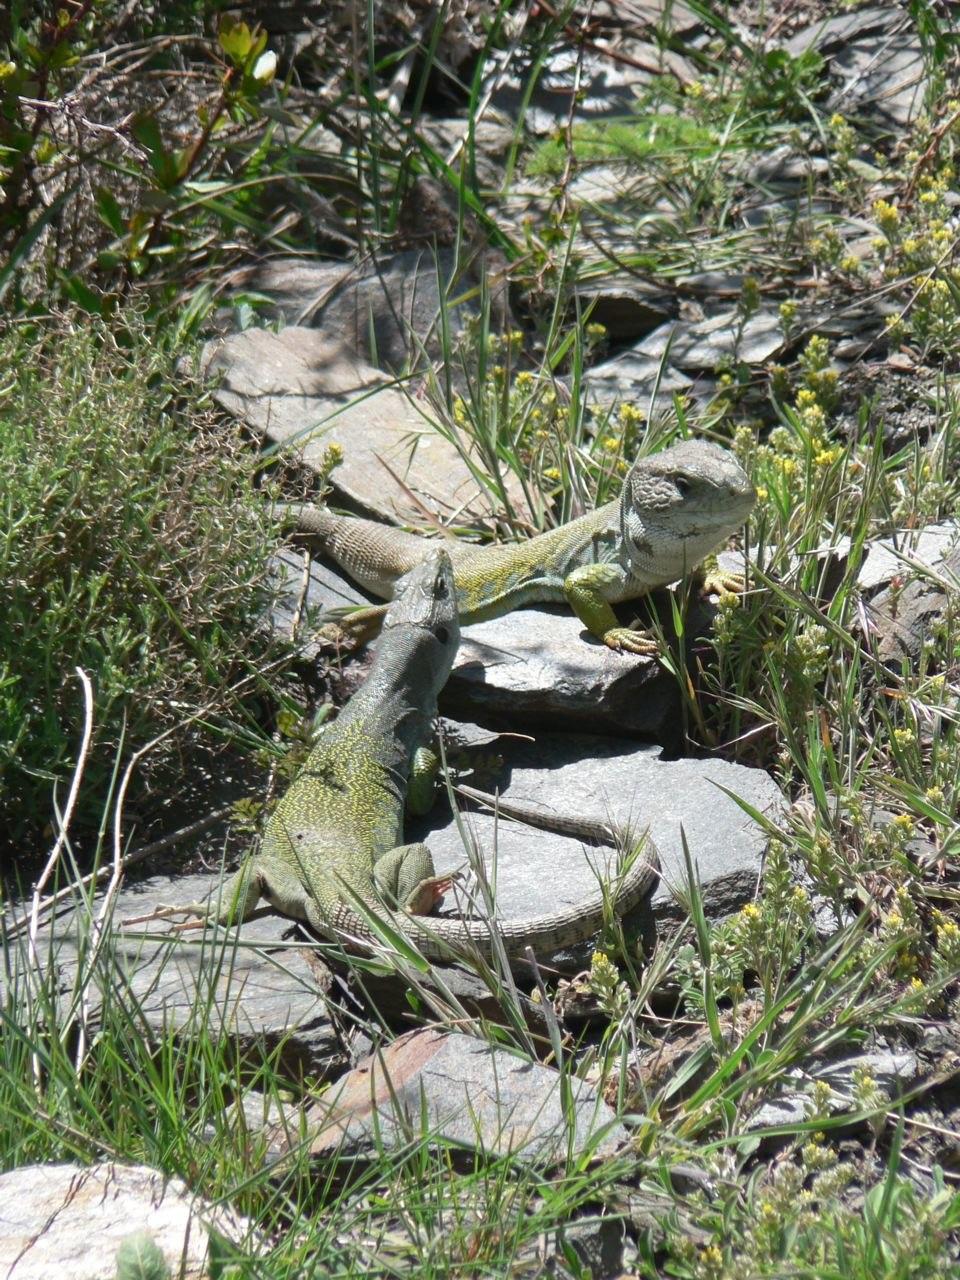 Ocellated lizard, Timon lepidus, male and female Sierra Nevada, Spain